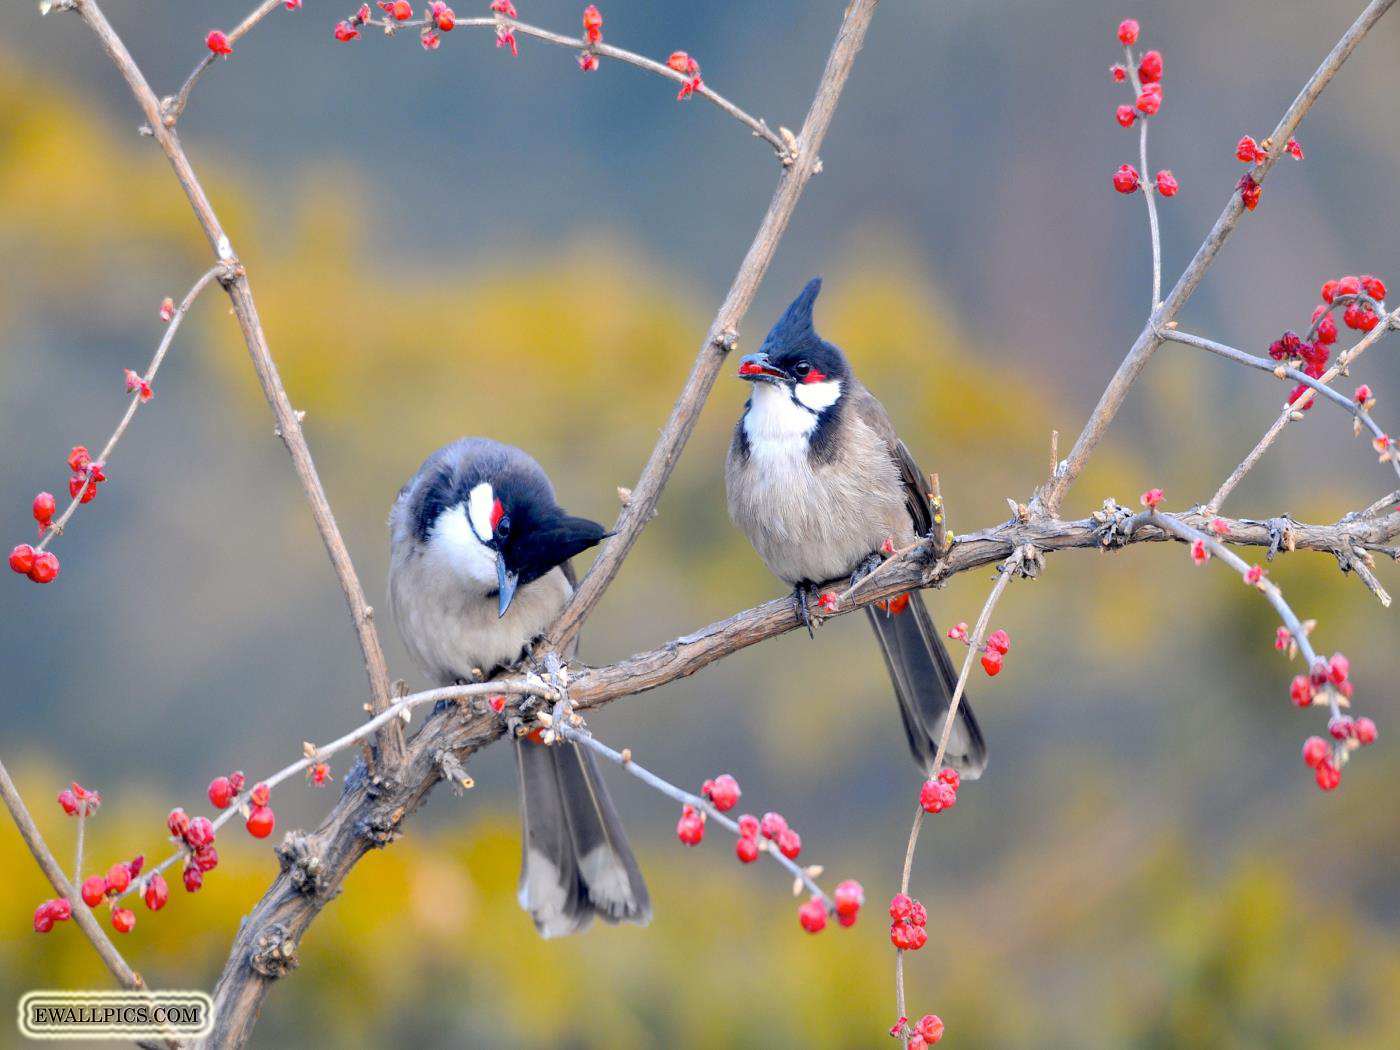 huppes-oiseaux-en-couple